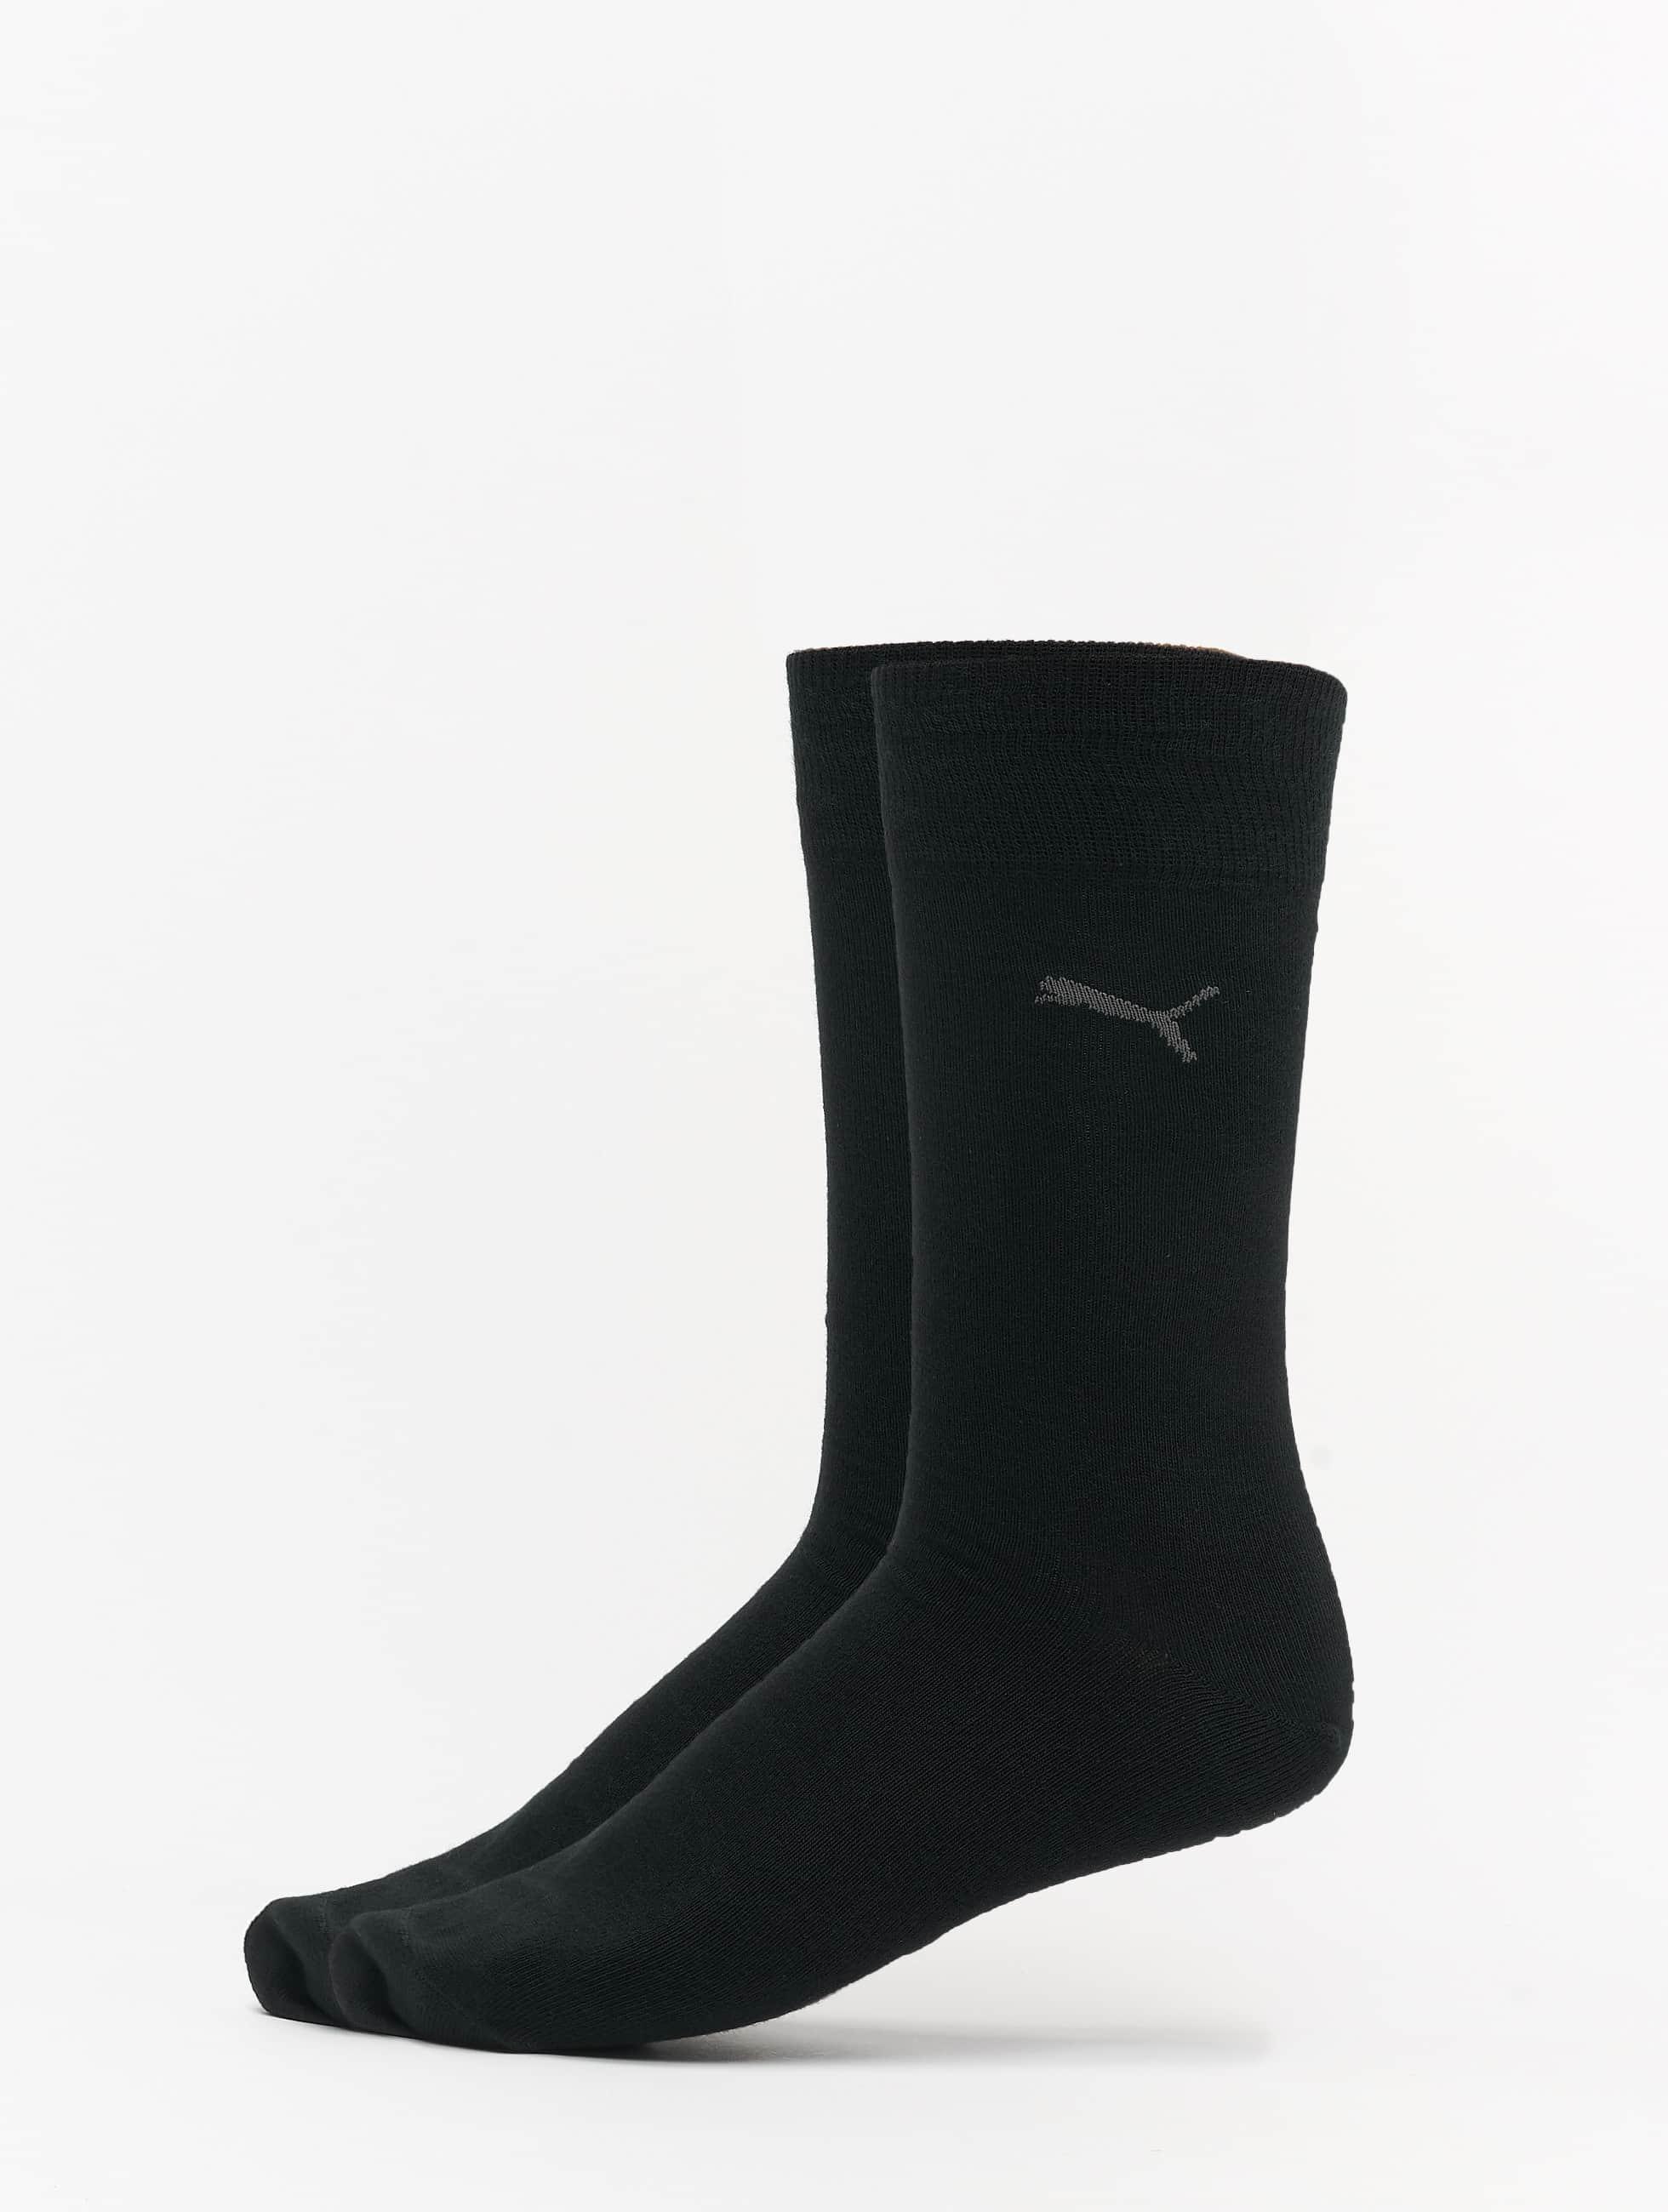 Puma 2 Pack Classic Socks Black